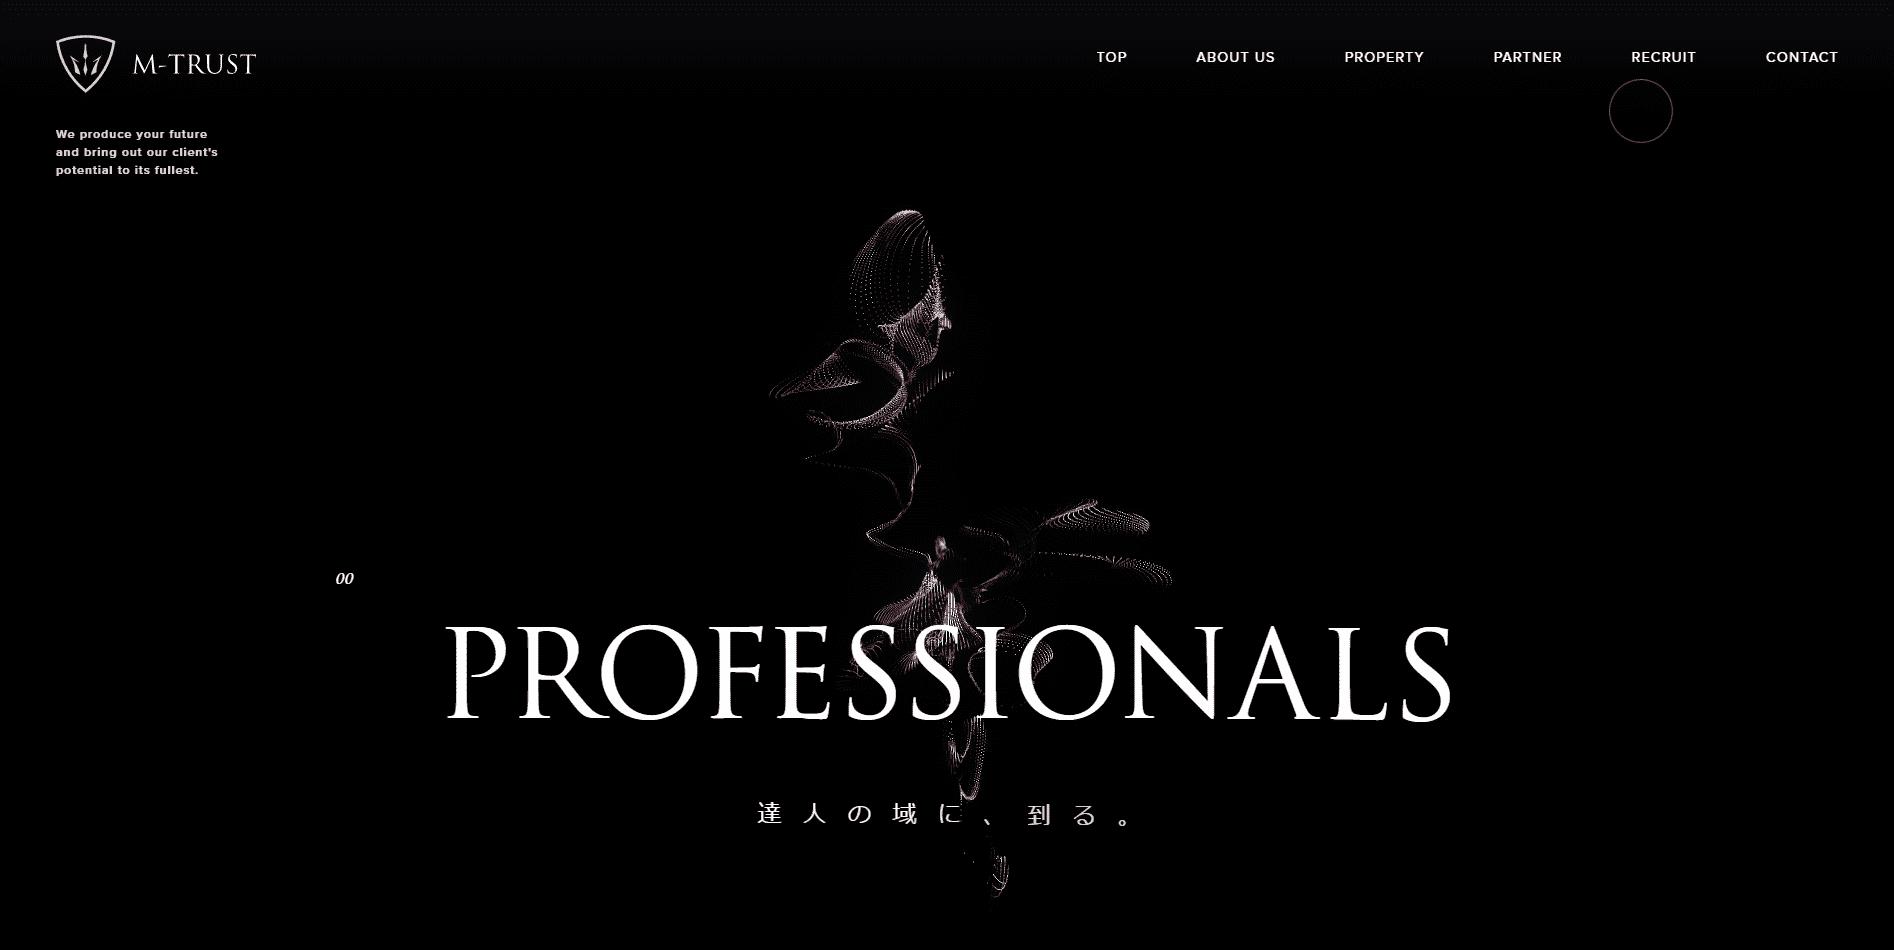 Best Agency Website for M-Trust